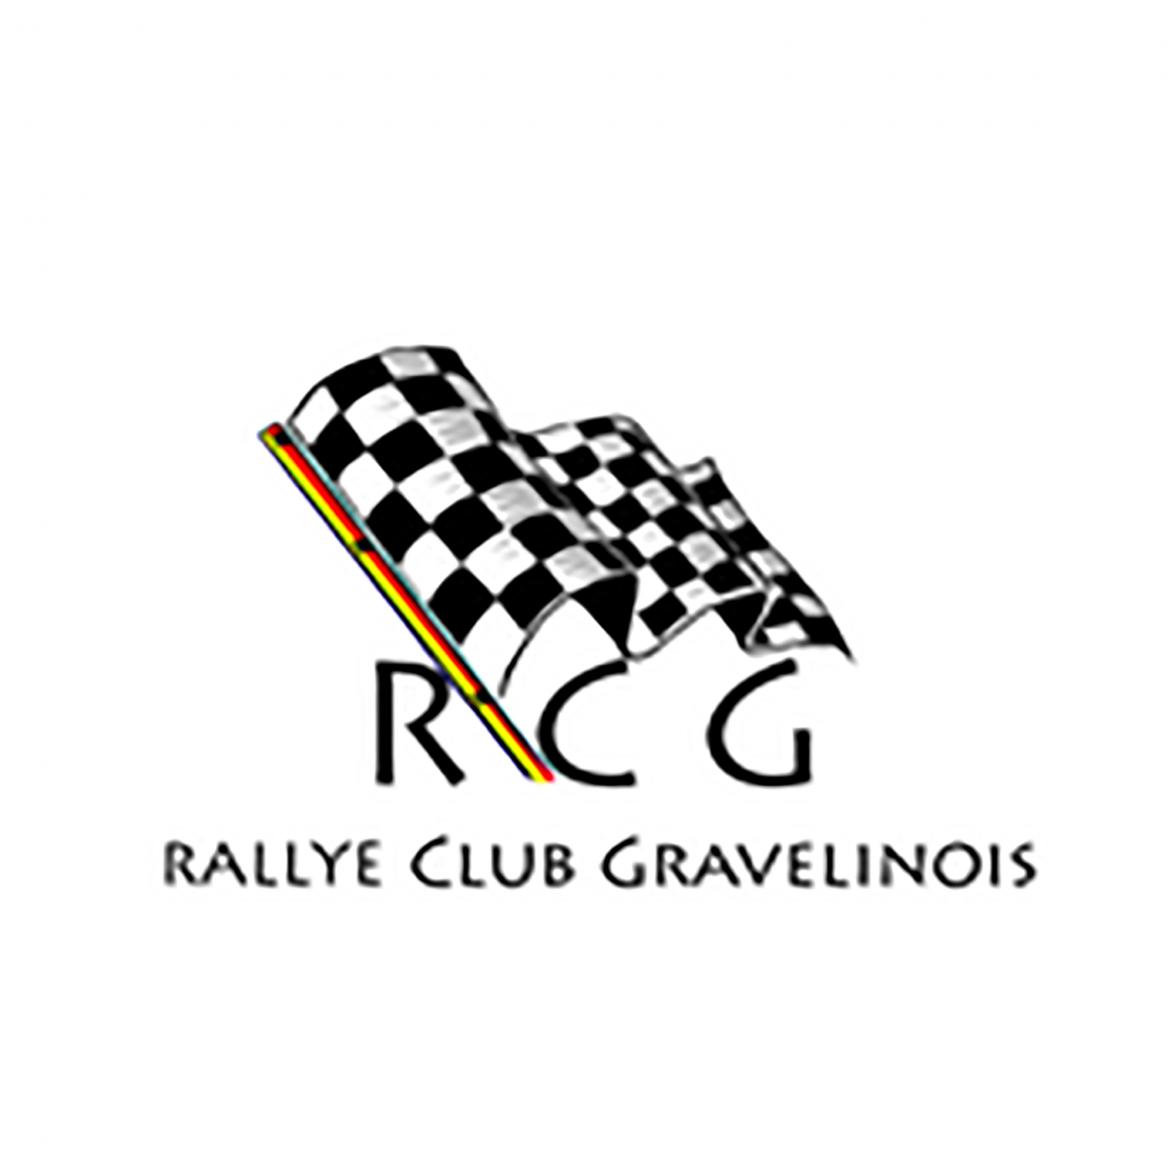 Angèle Von kiss - Mes clients - RALLYE CLUB GRAVELINOIS